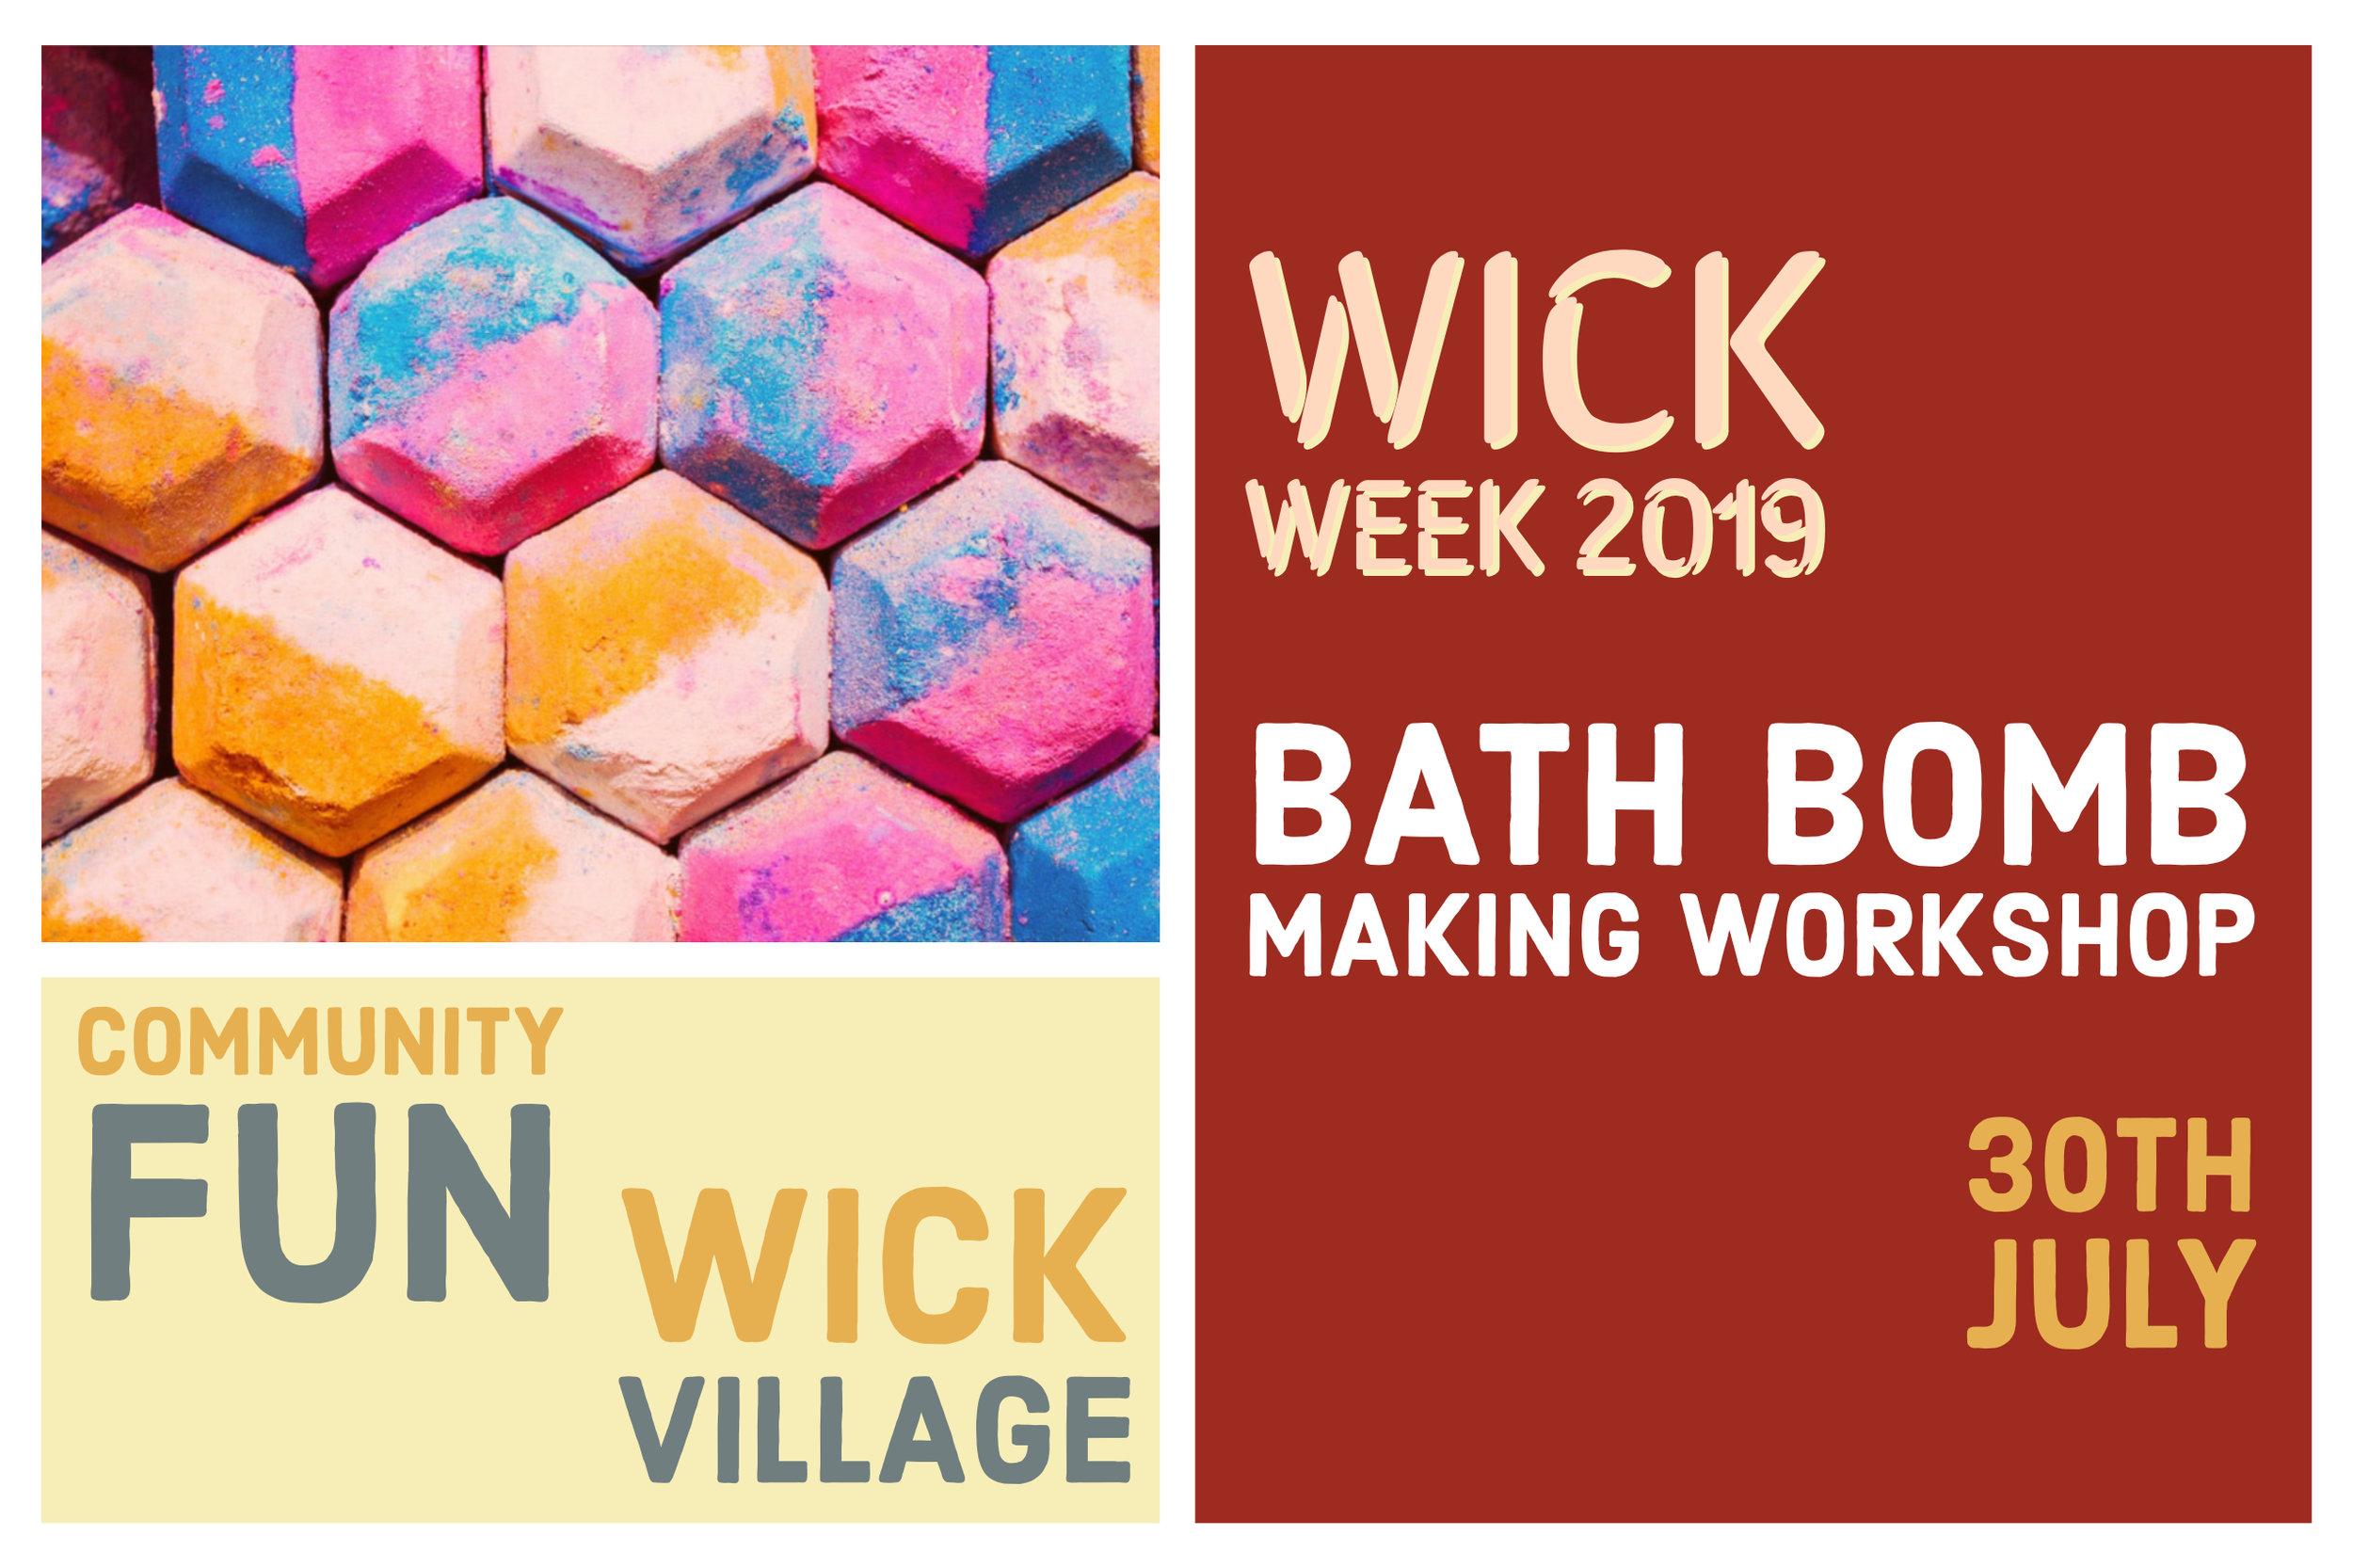 Wick Week 2019 Bath Bomb Workshop.